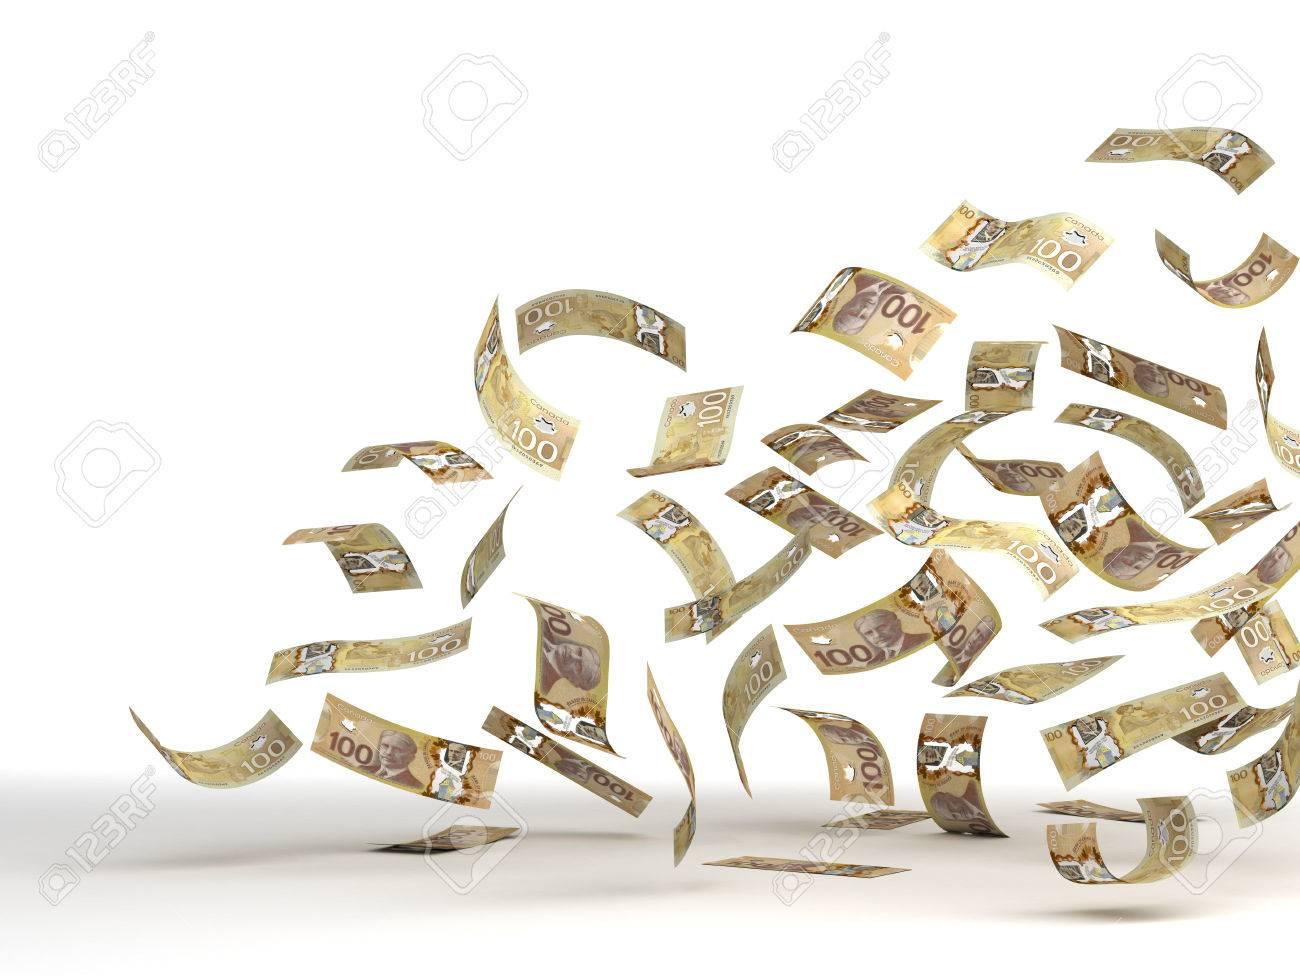 Flying Canadian Dollar isolated - 23557331